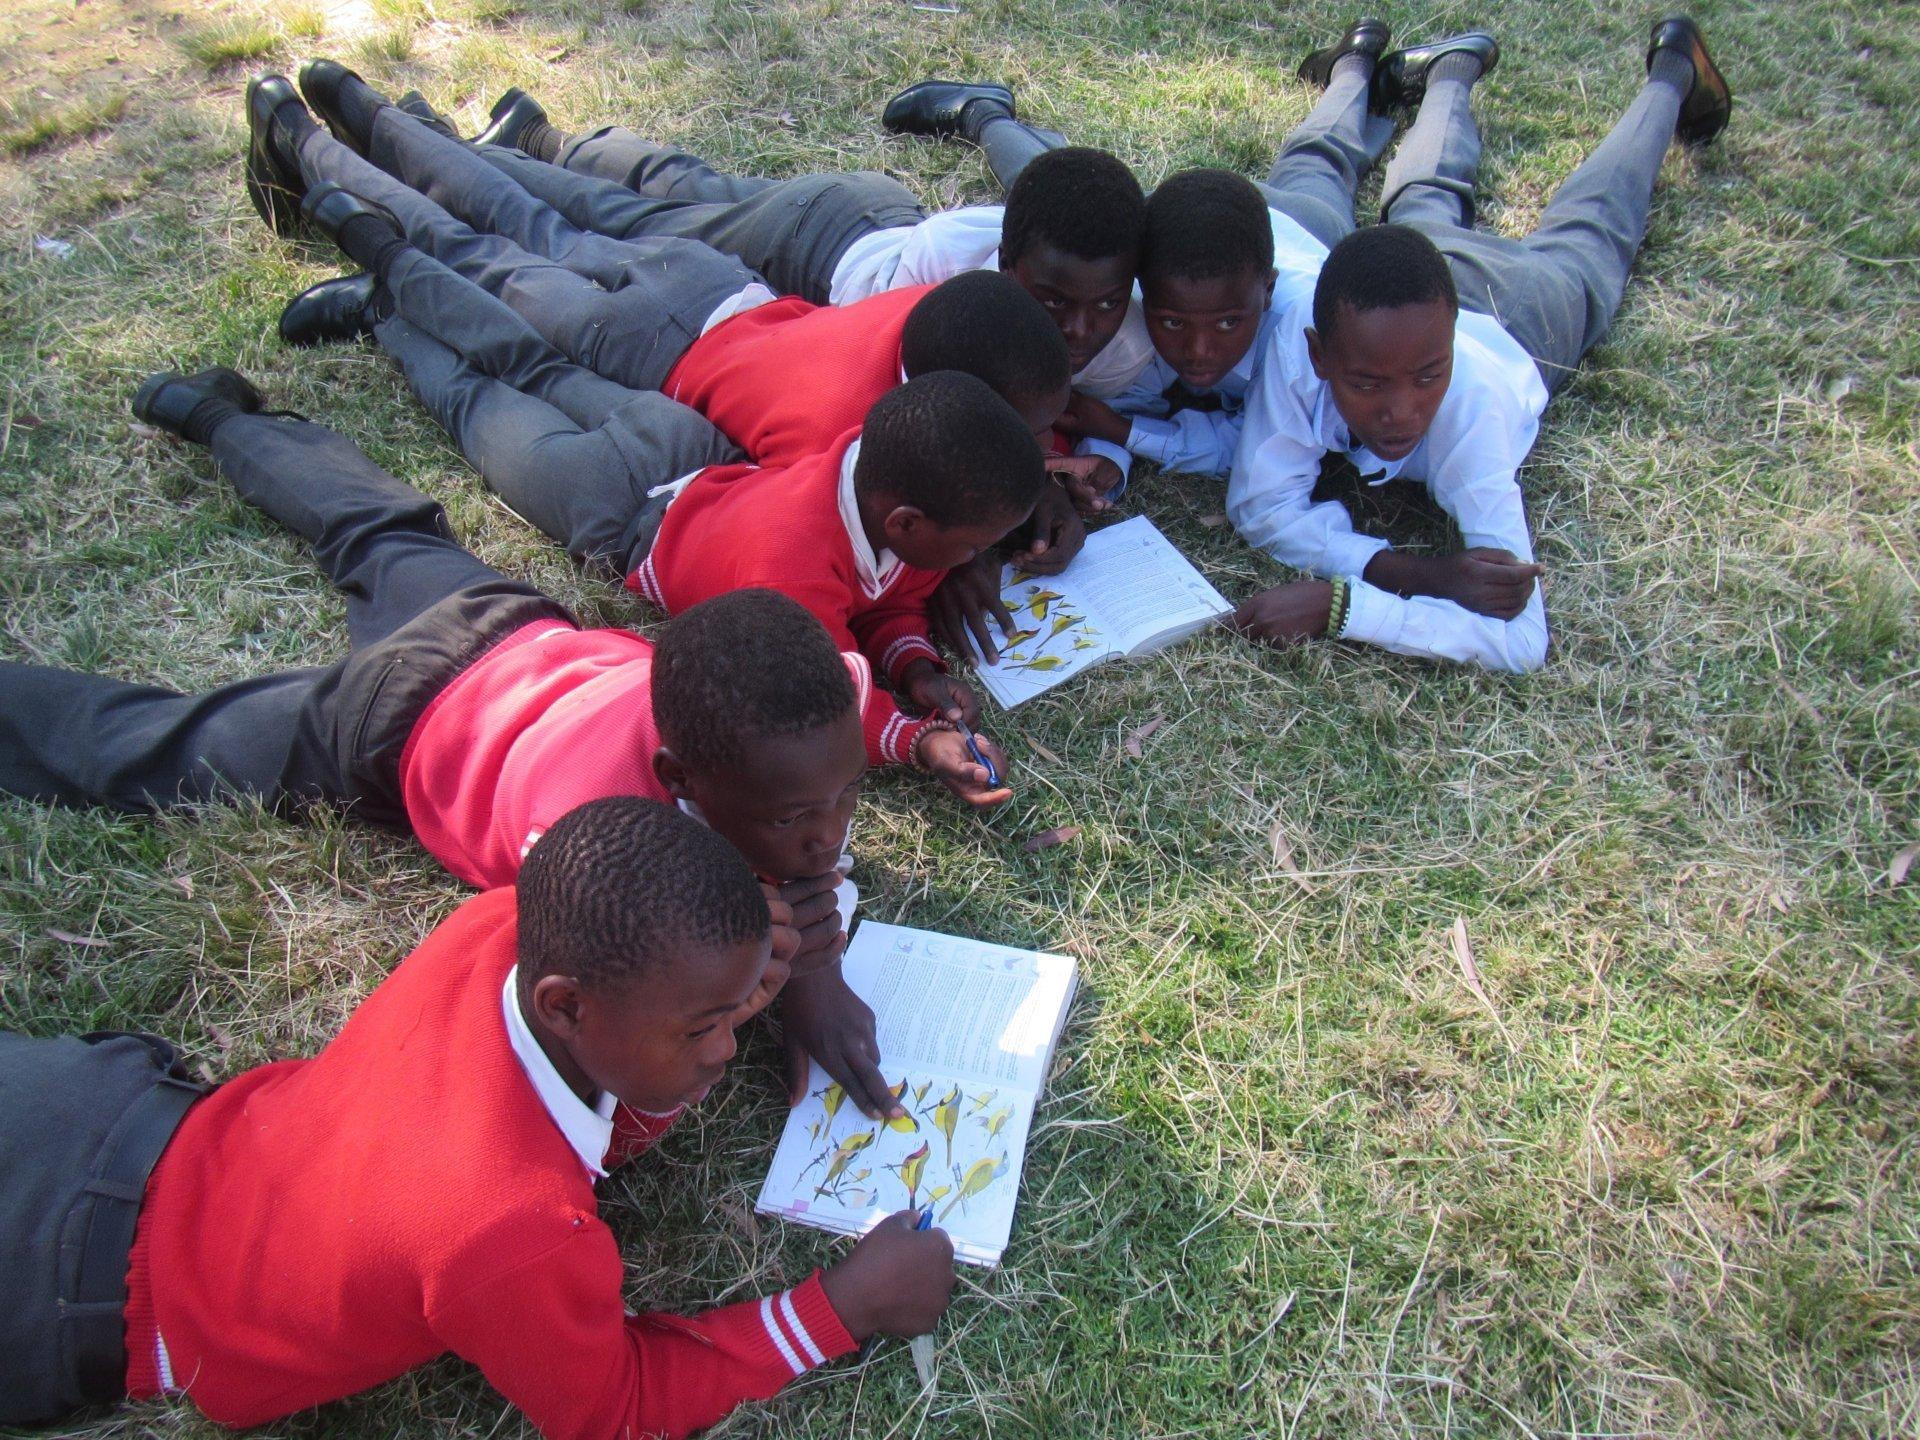 Boys on ground with bird books